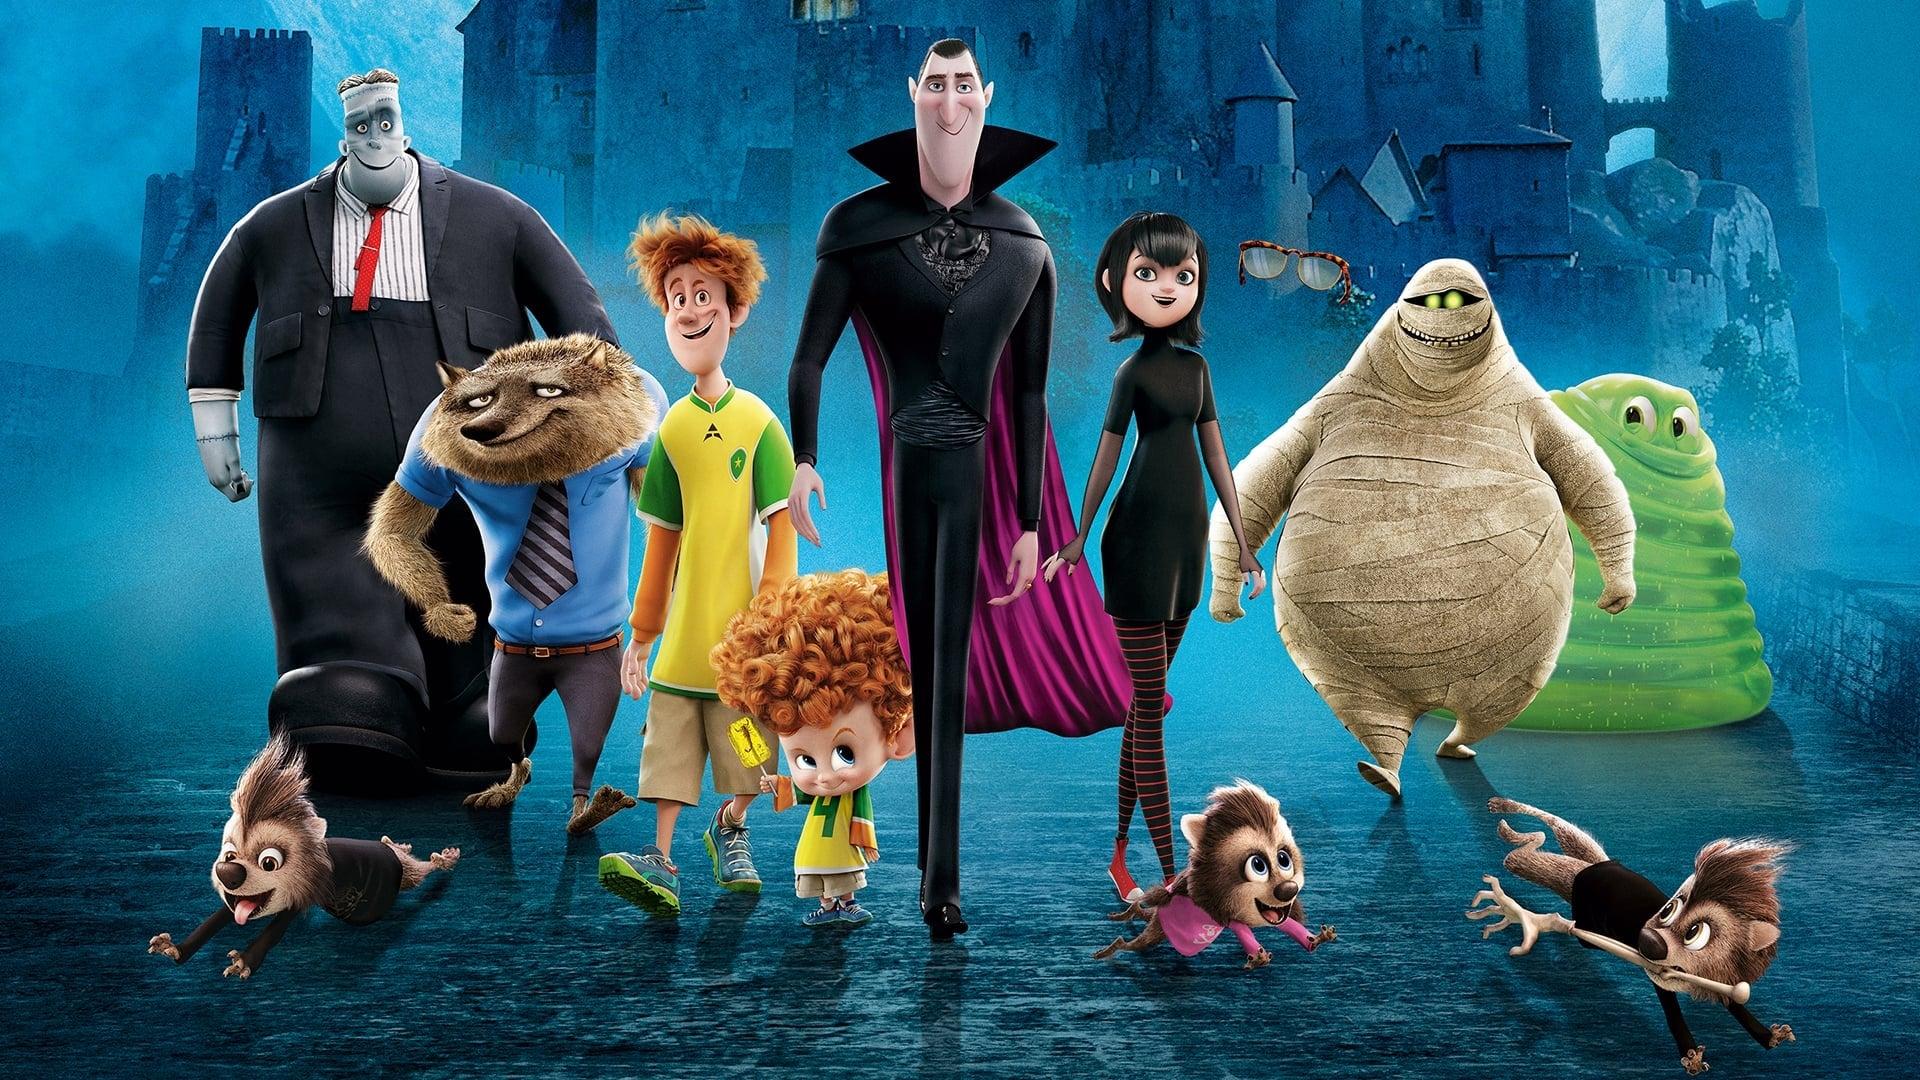 Hotel Transylvania 2 Movie Streaming Online Watch on Amazon, Google Play, Sony LIV, Tata Sky , Youtube, iTunes